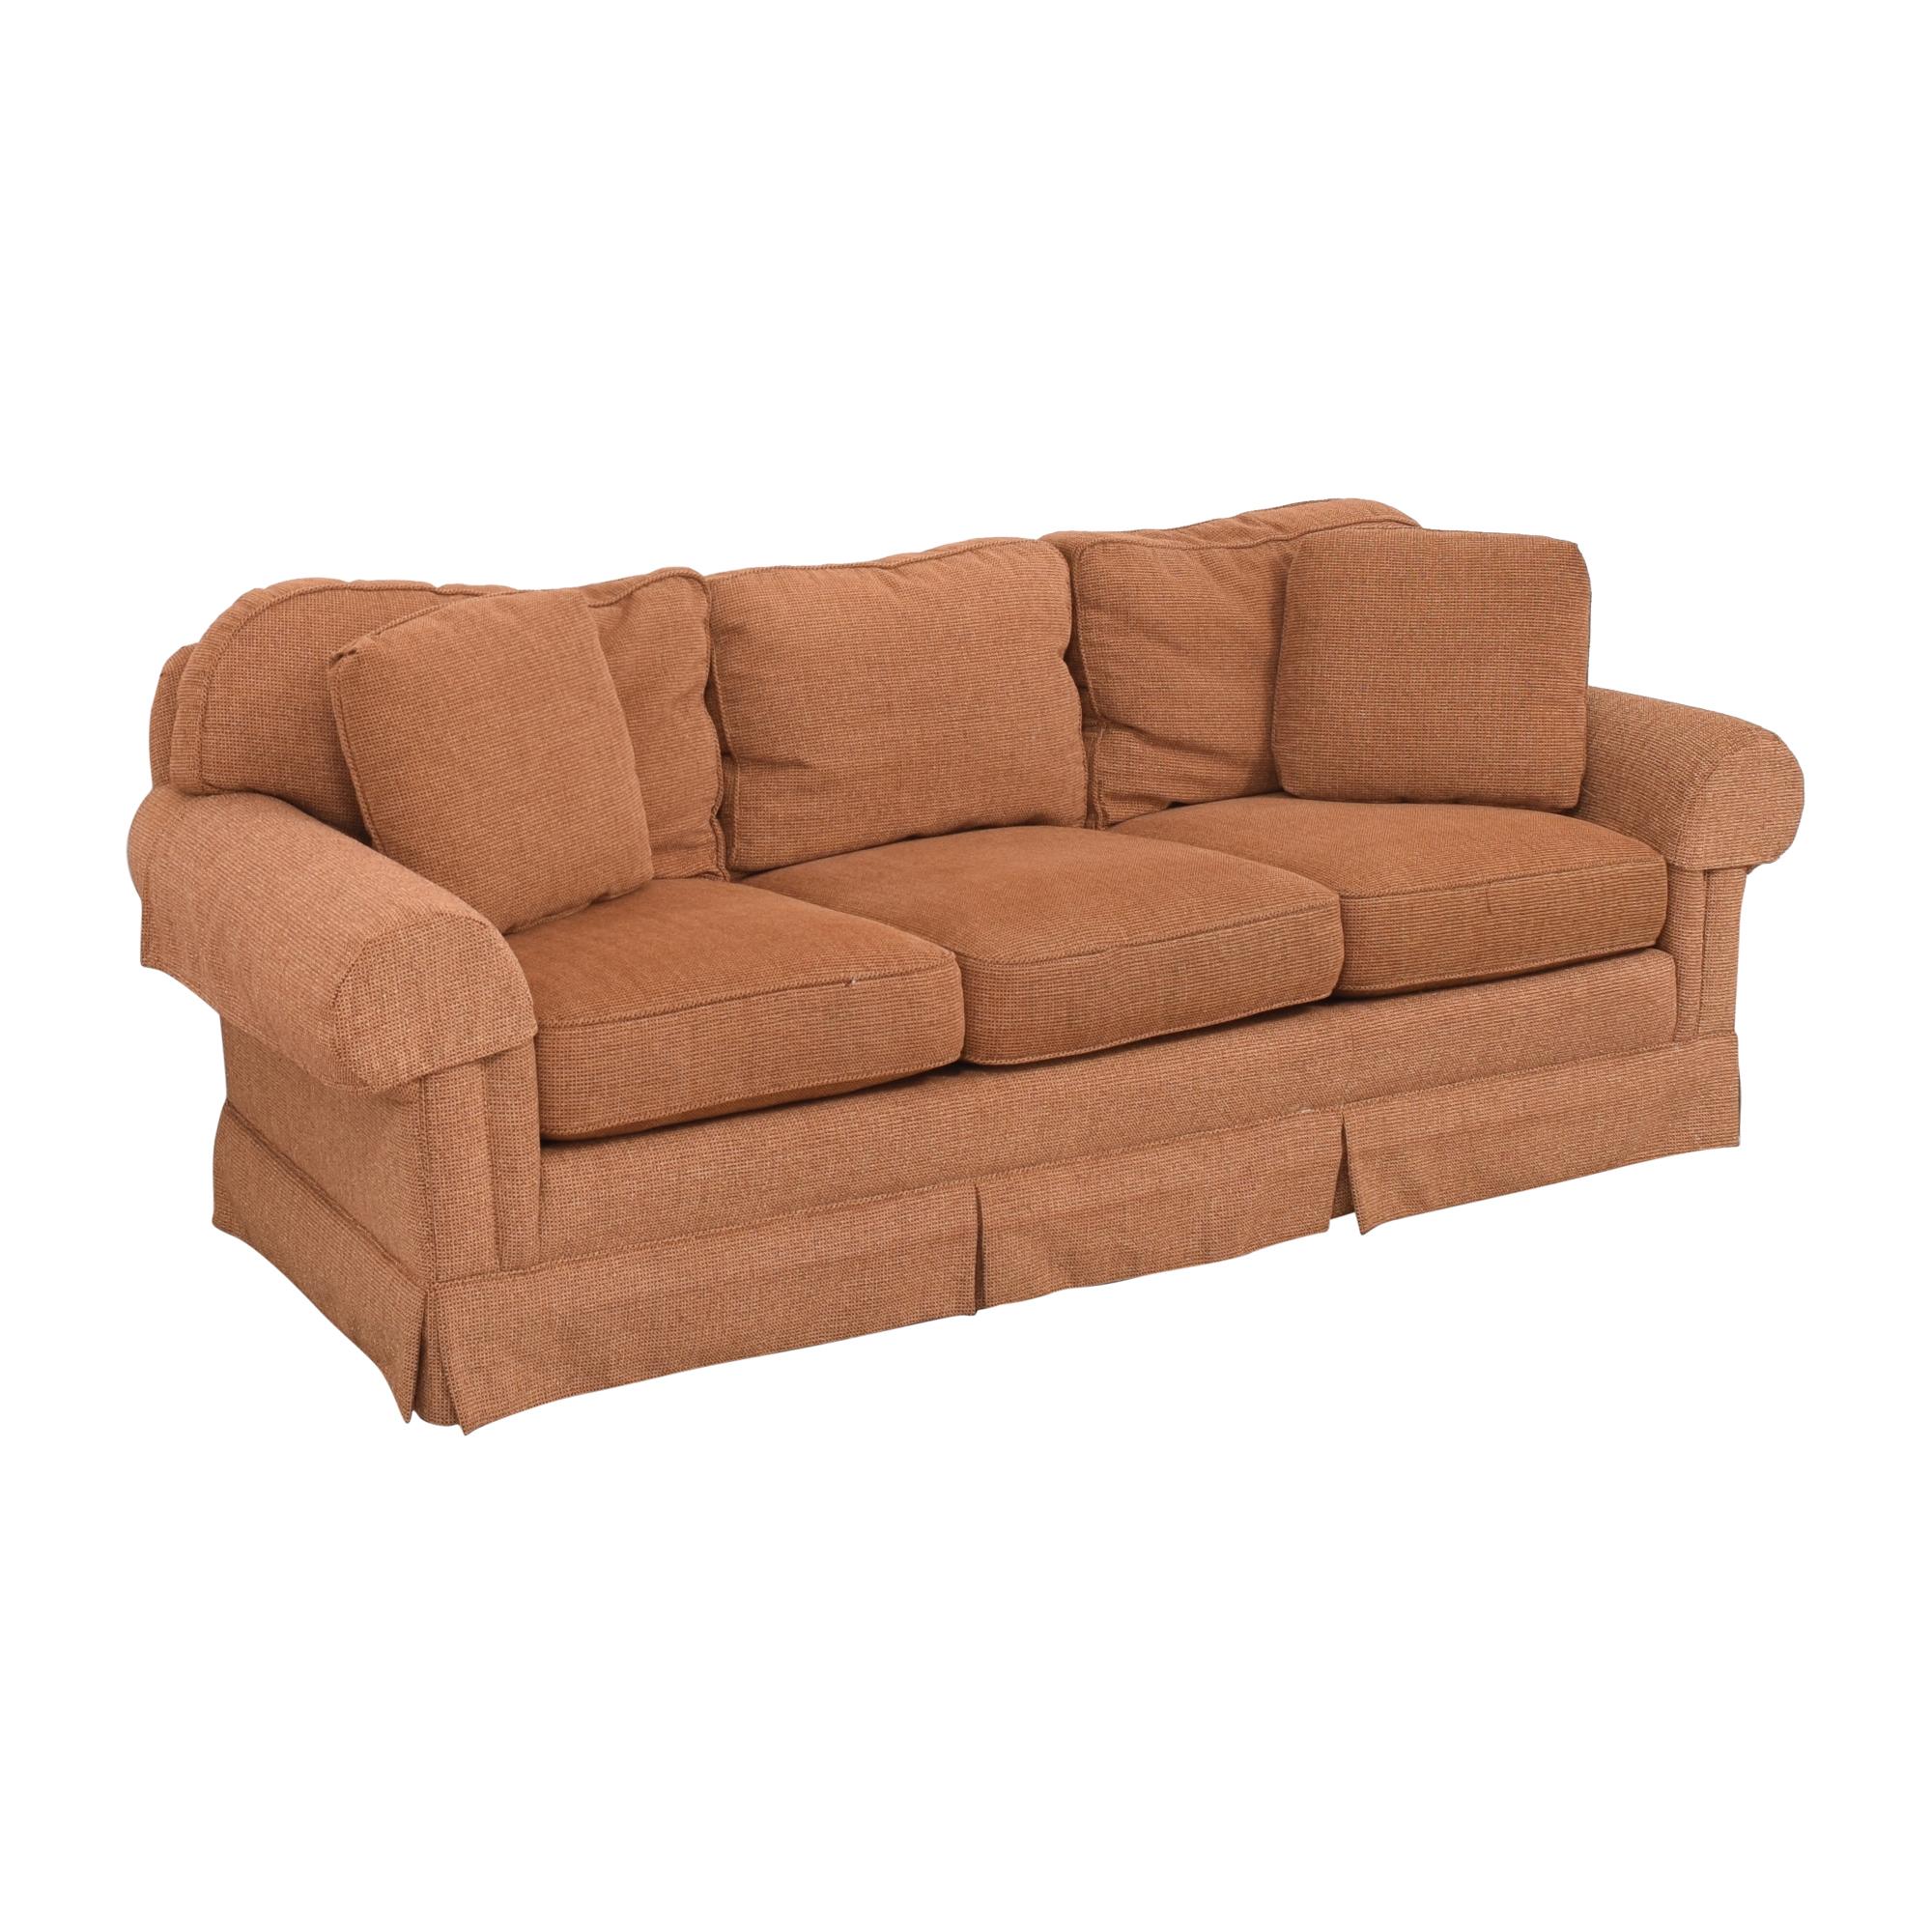 Calico Calico Three Cushion Sofa price